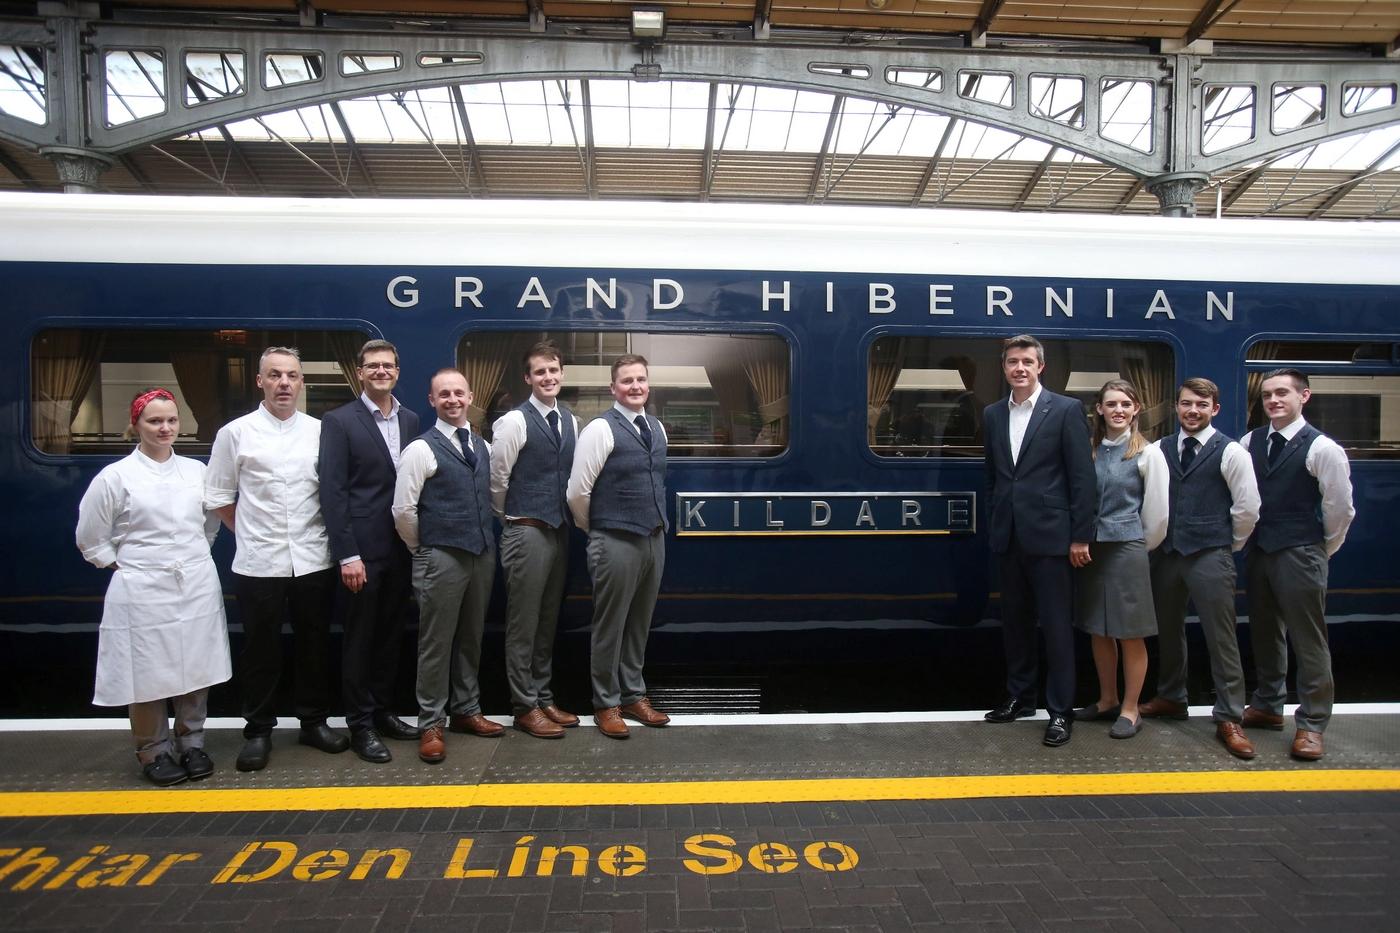 Inside Ireland's first luxury train: the Belmond Grand Hibernian